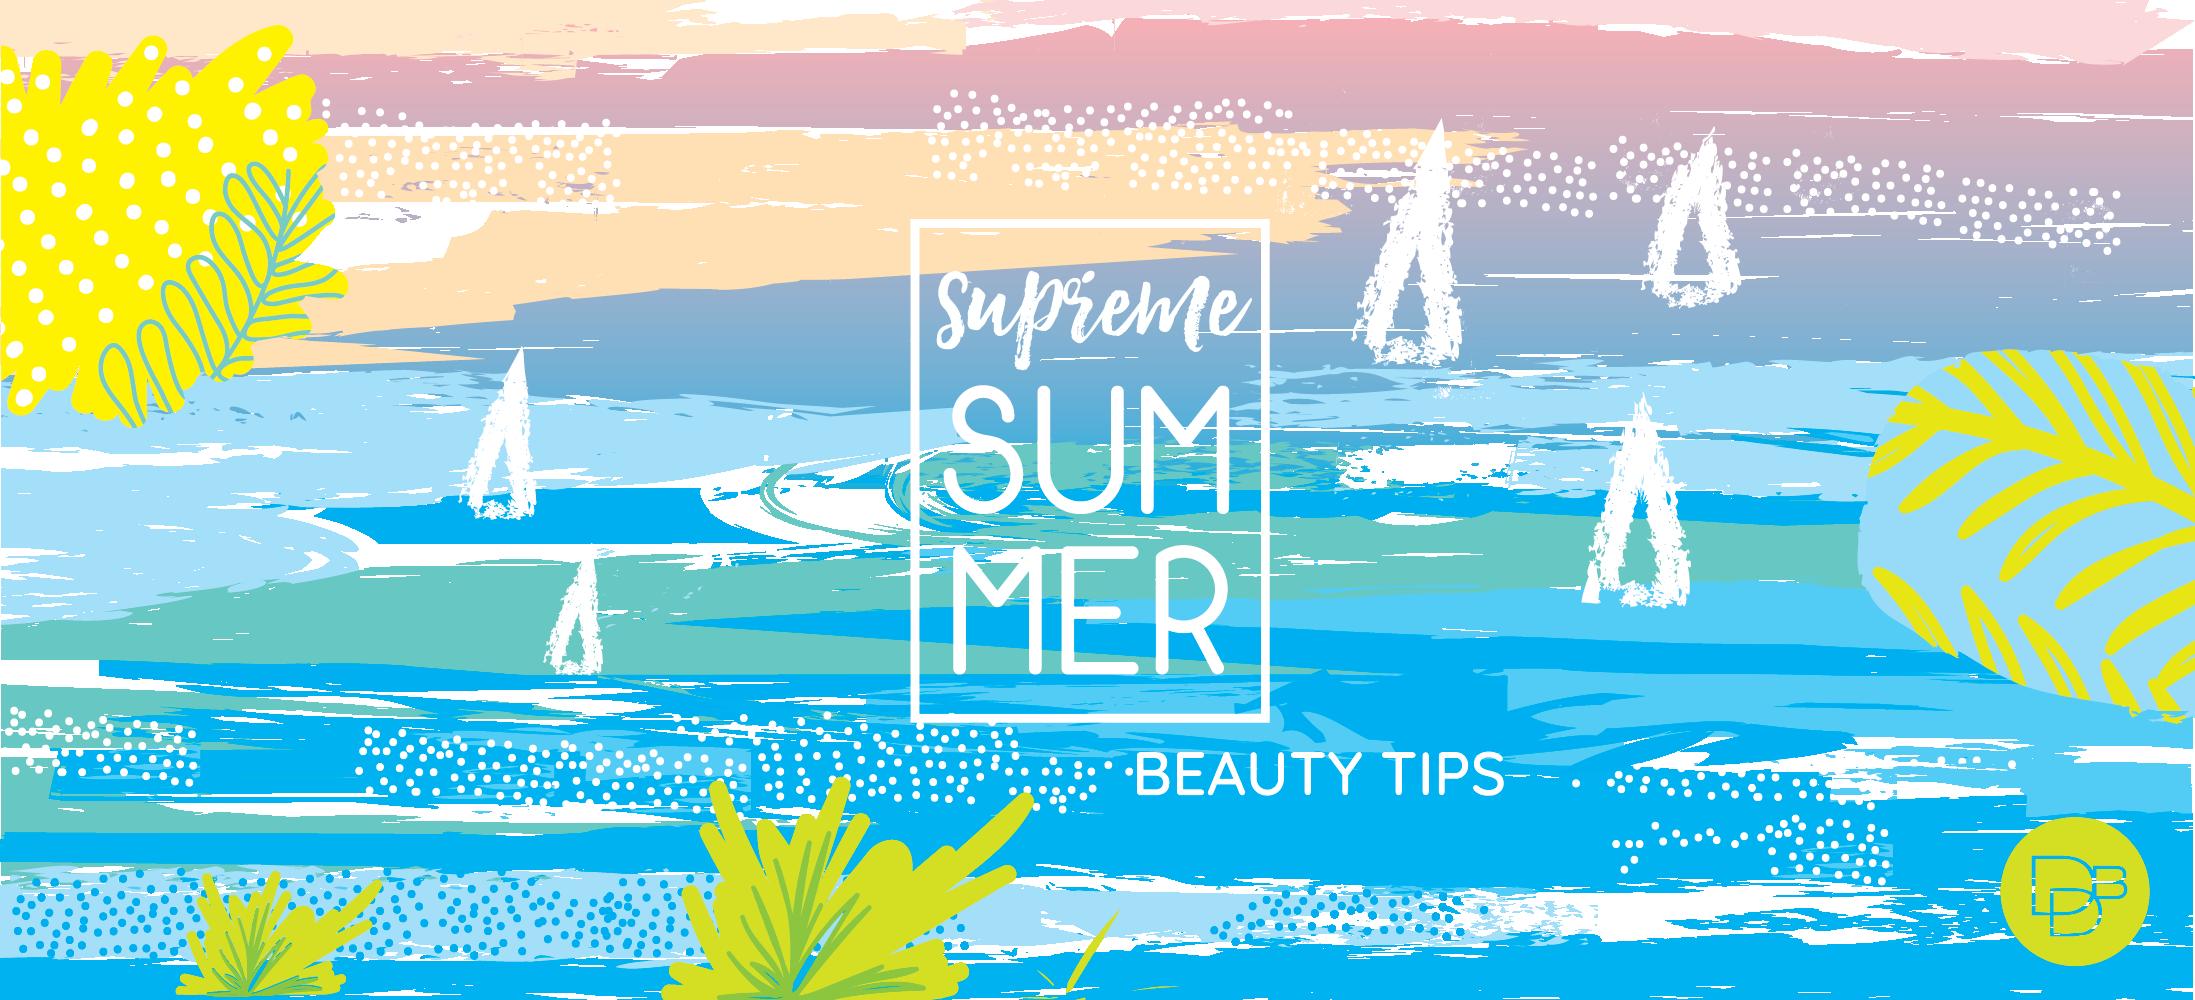 Dino Dilio Beauty - Supreme Summer Beauty Tips